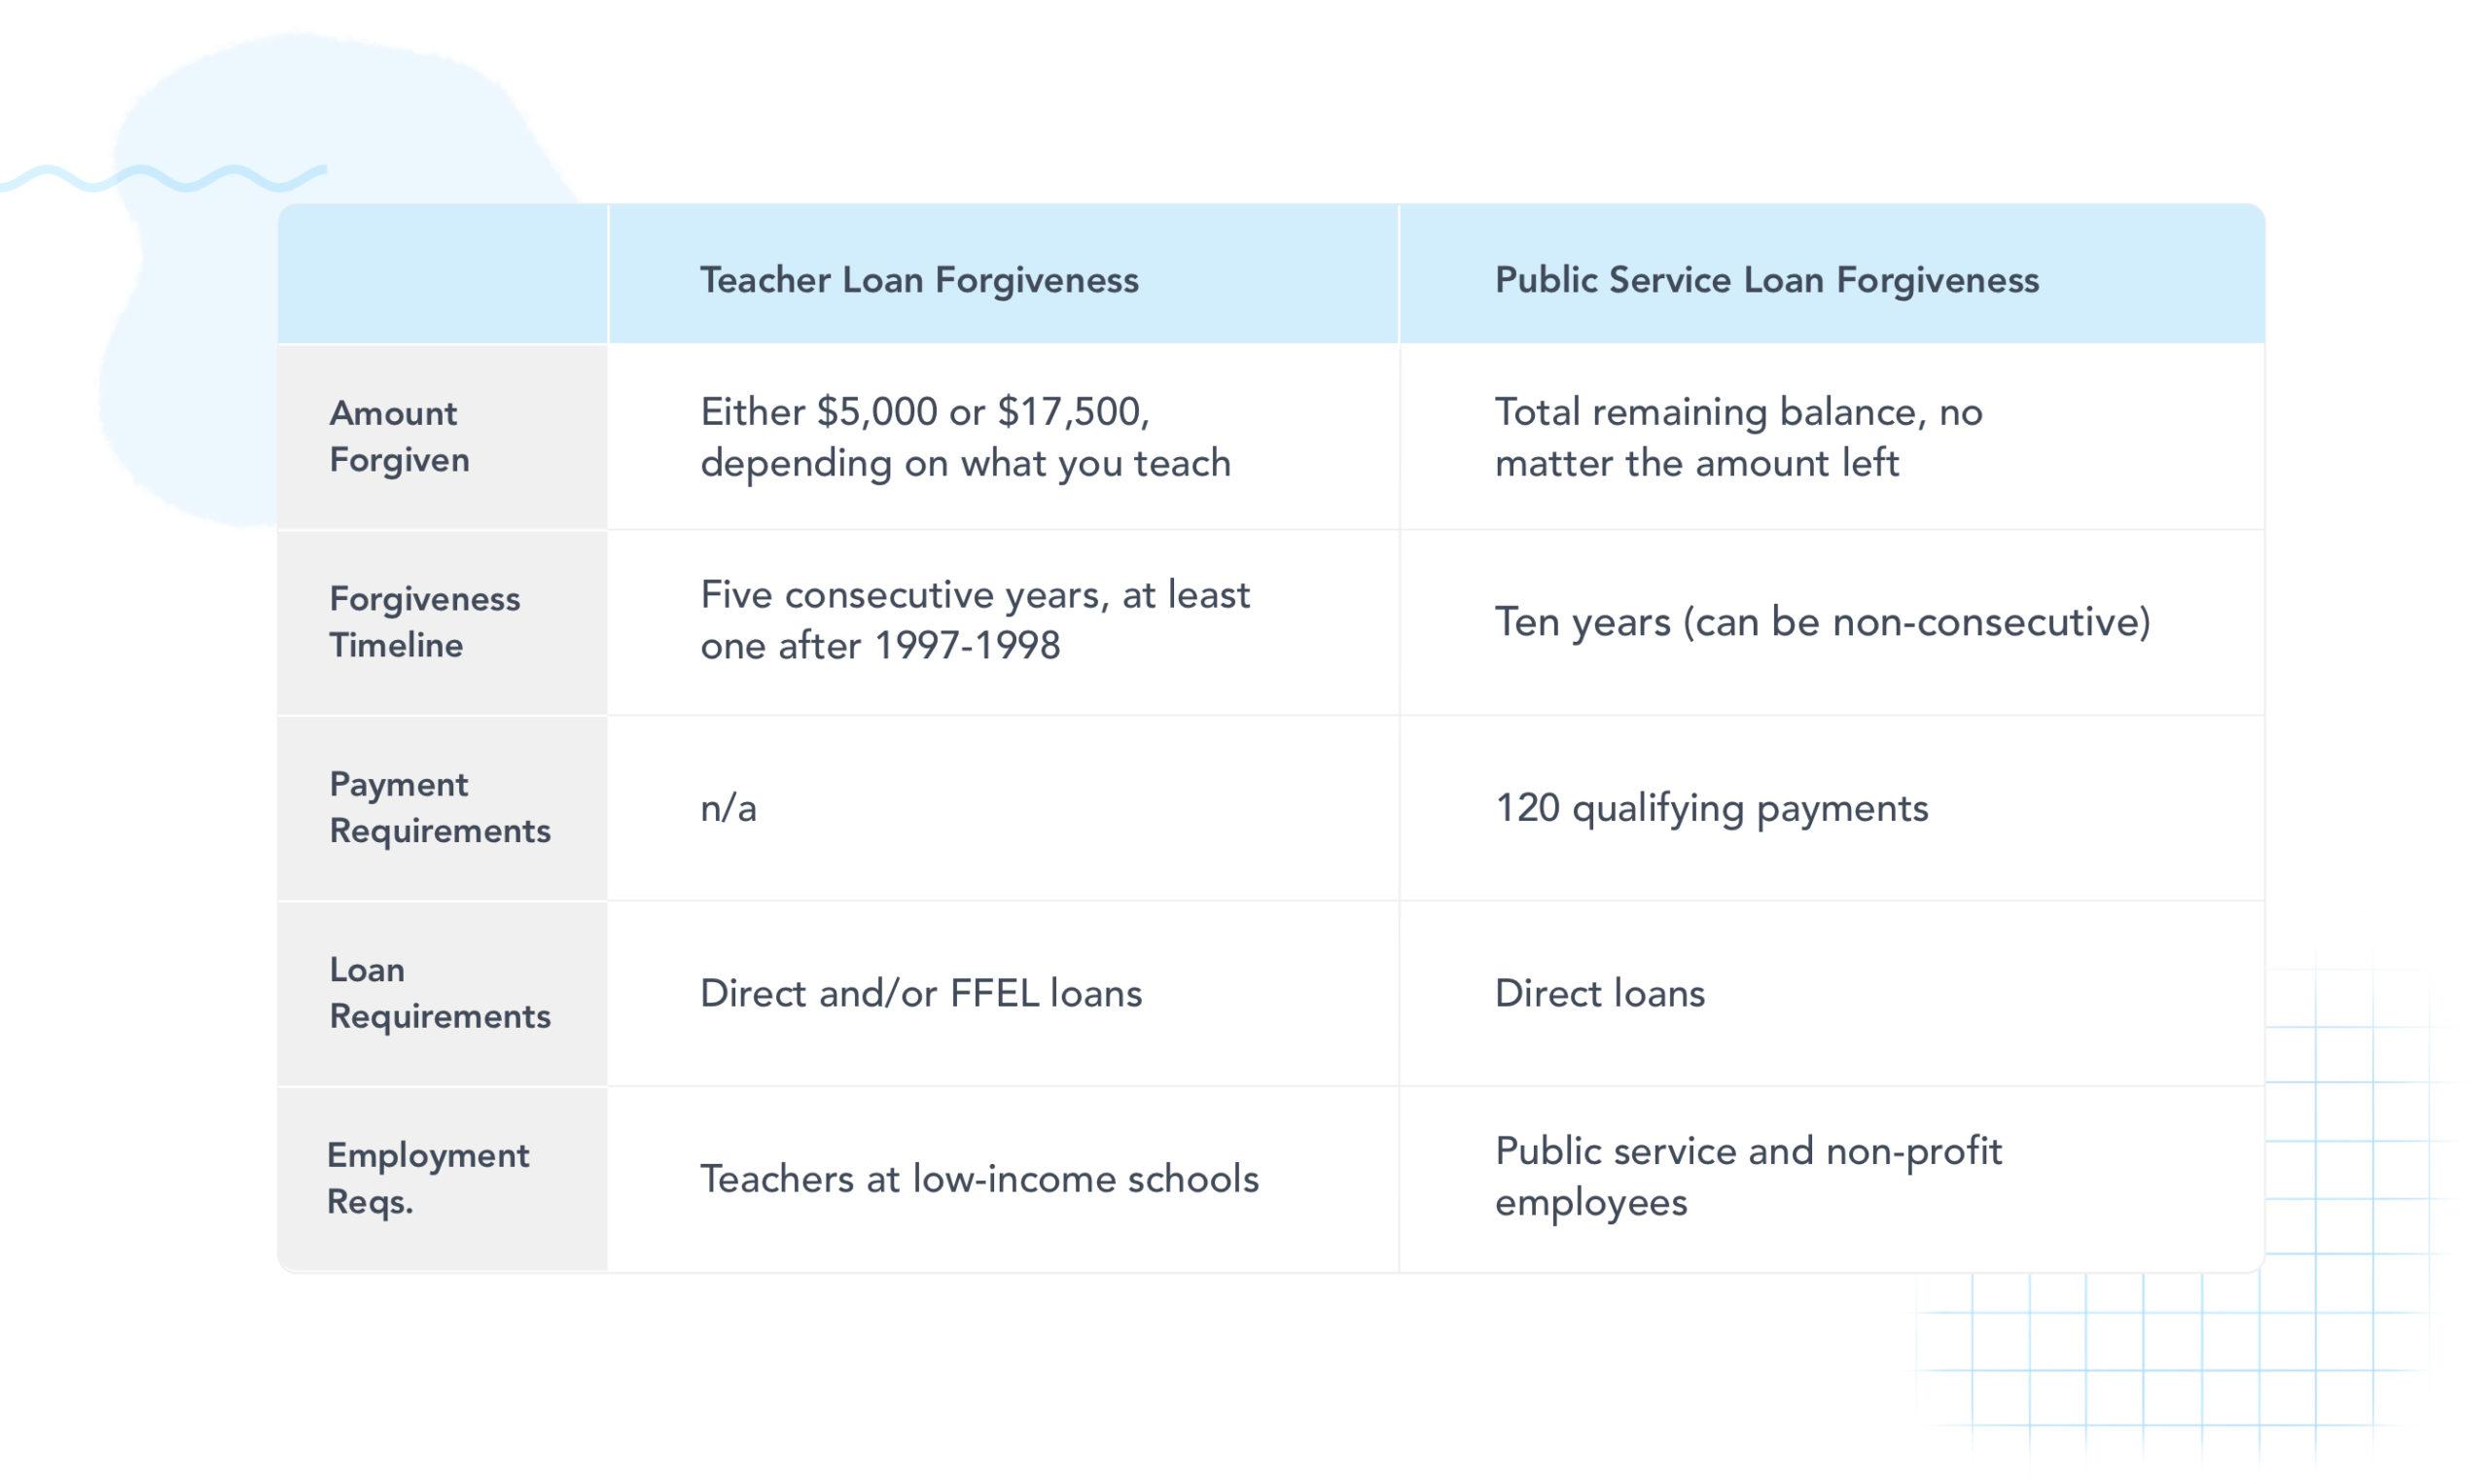 Teacher Loan Forgiveness vs. Public Service Loan Forgiveness